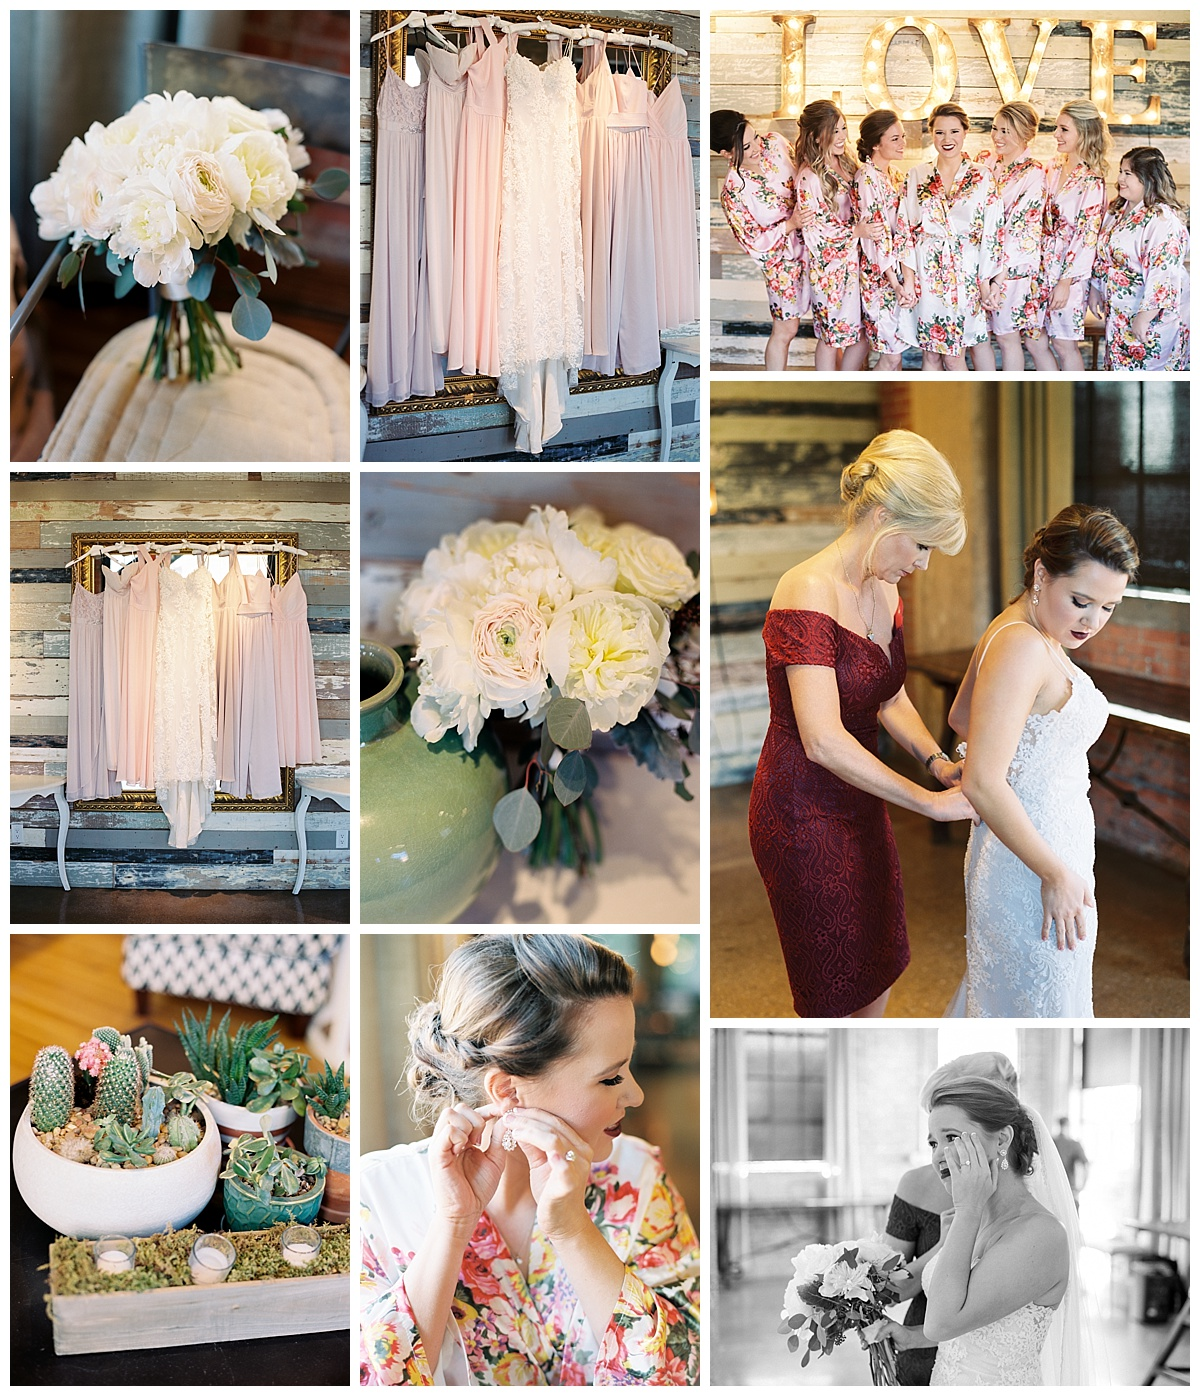 hickory-stree-annex-wedding-ar-photography-nicole-nolan-3.jpg